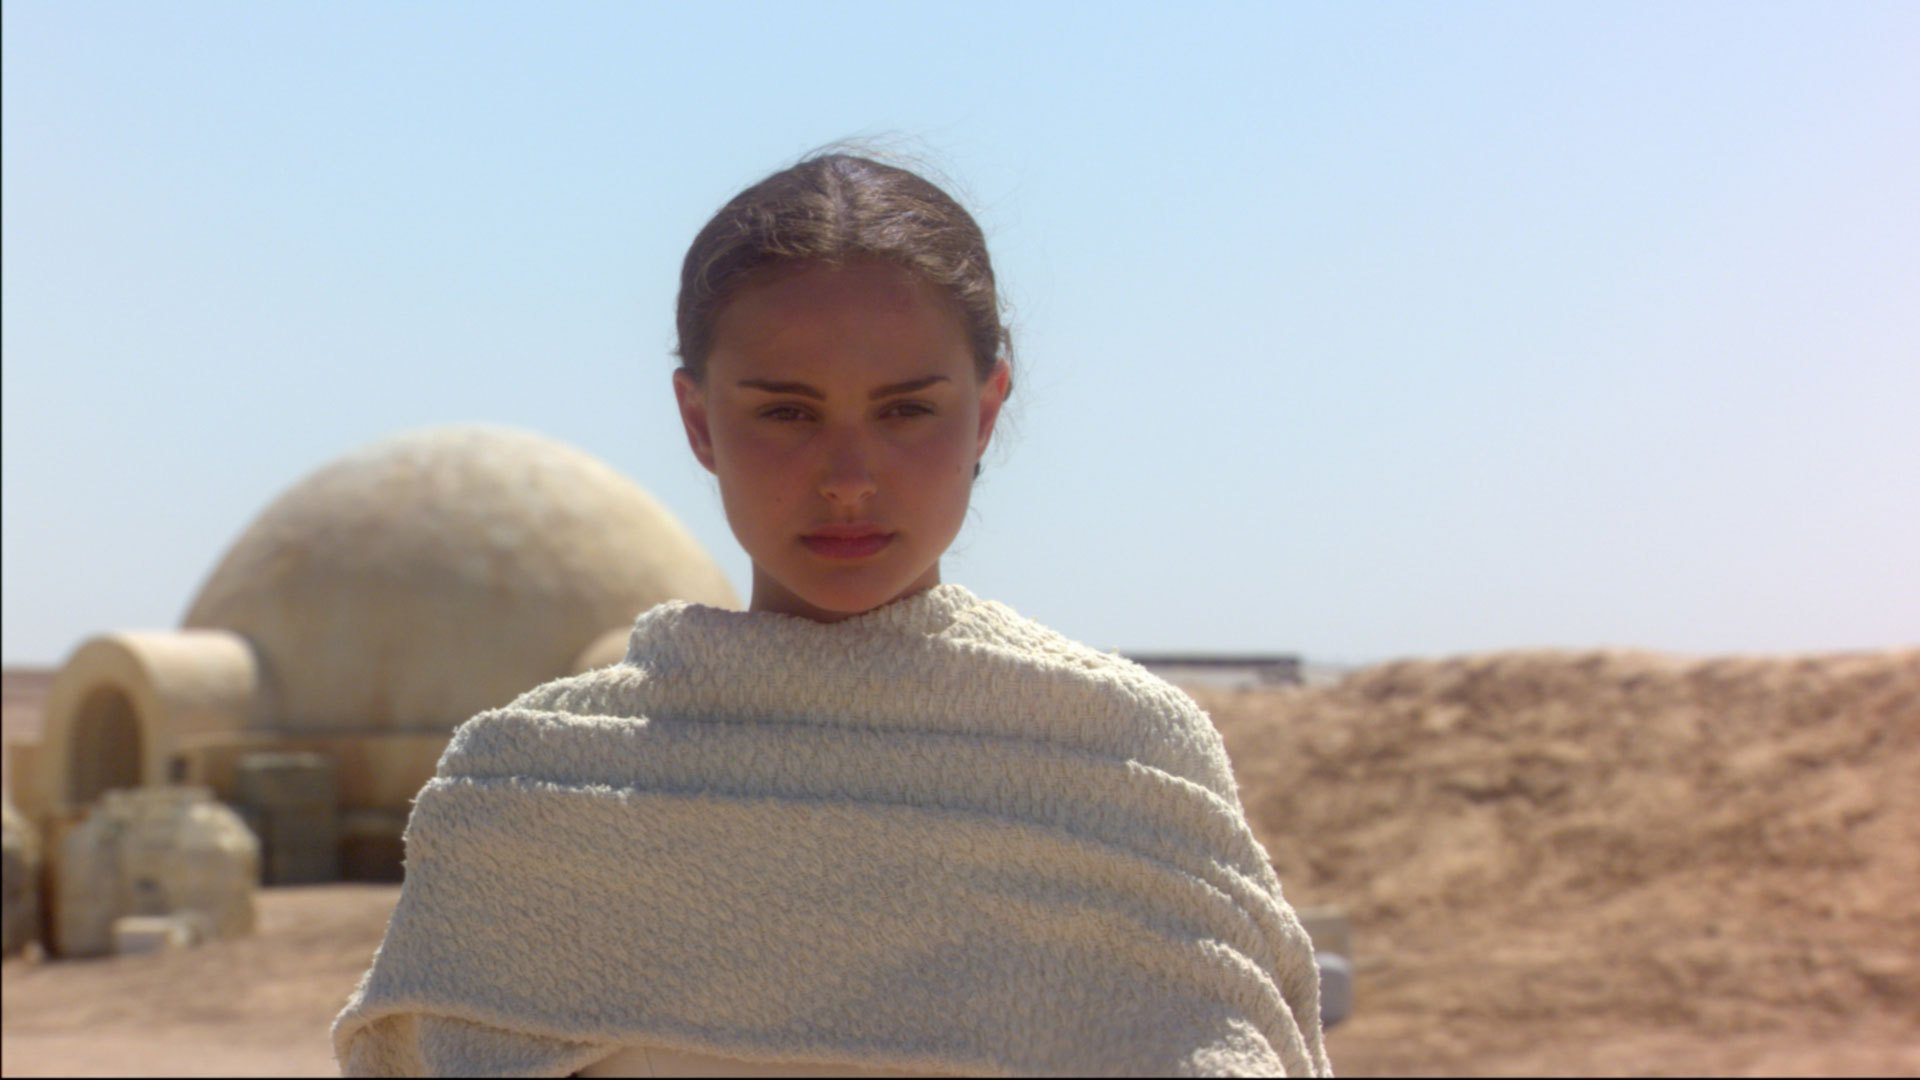 Star Wars Natalie Portman Padme Amidala Wallpaper 1920x1080 237176 Wallpaperup